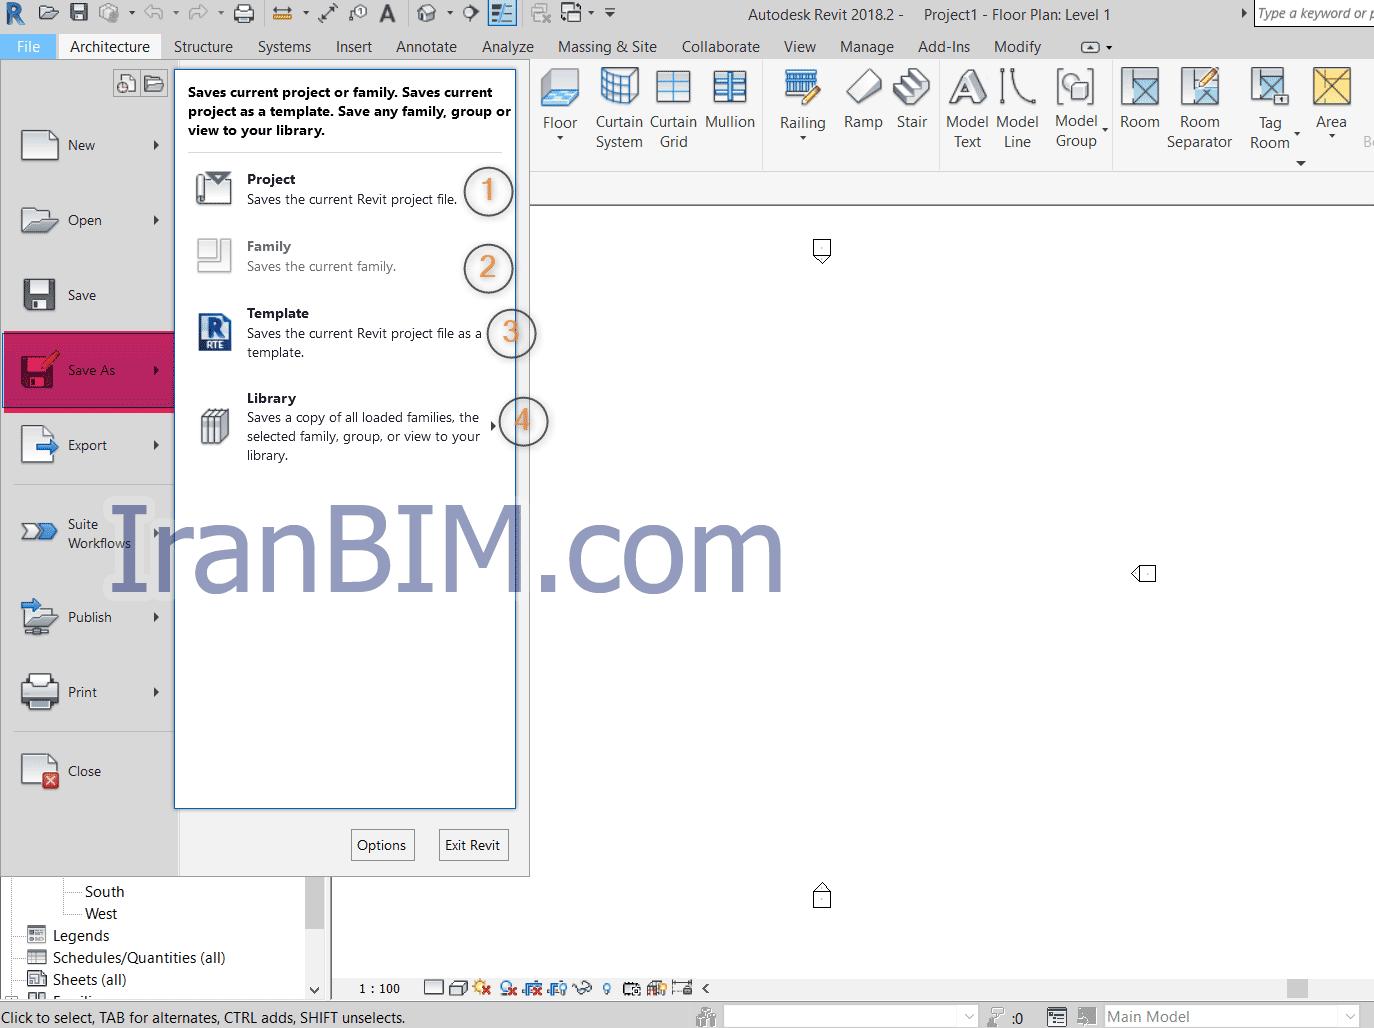 Save az: ذخیره فایل با نام و مکان مشخص